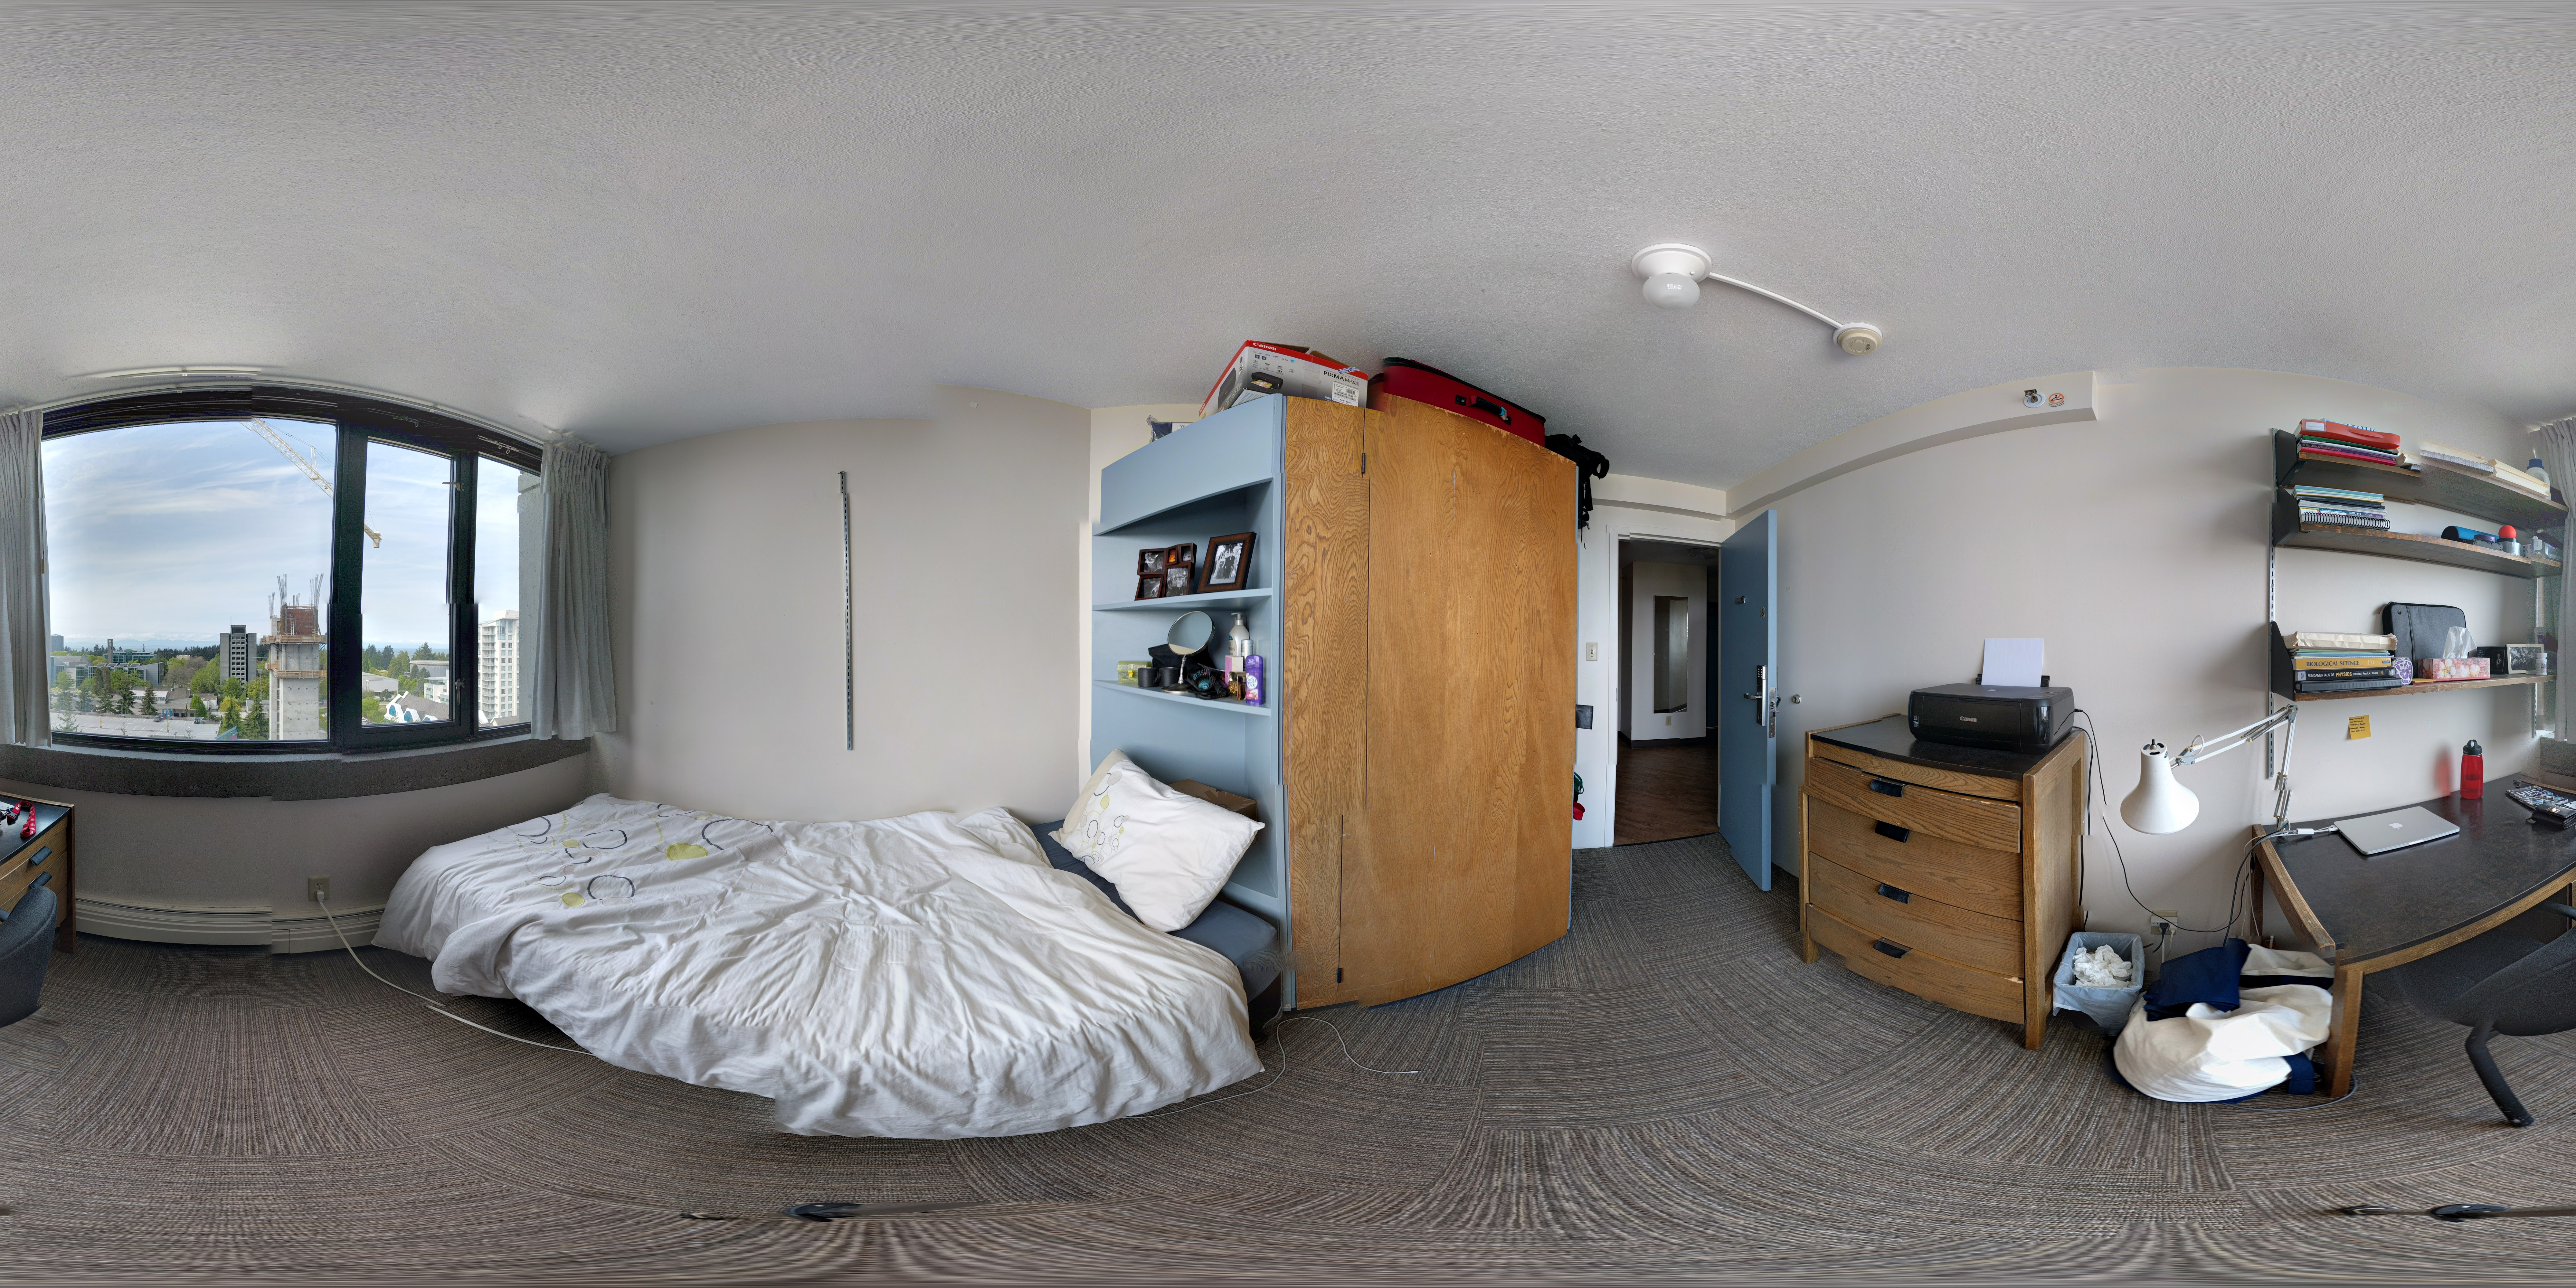 Most Expensive Studio Apartment